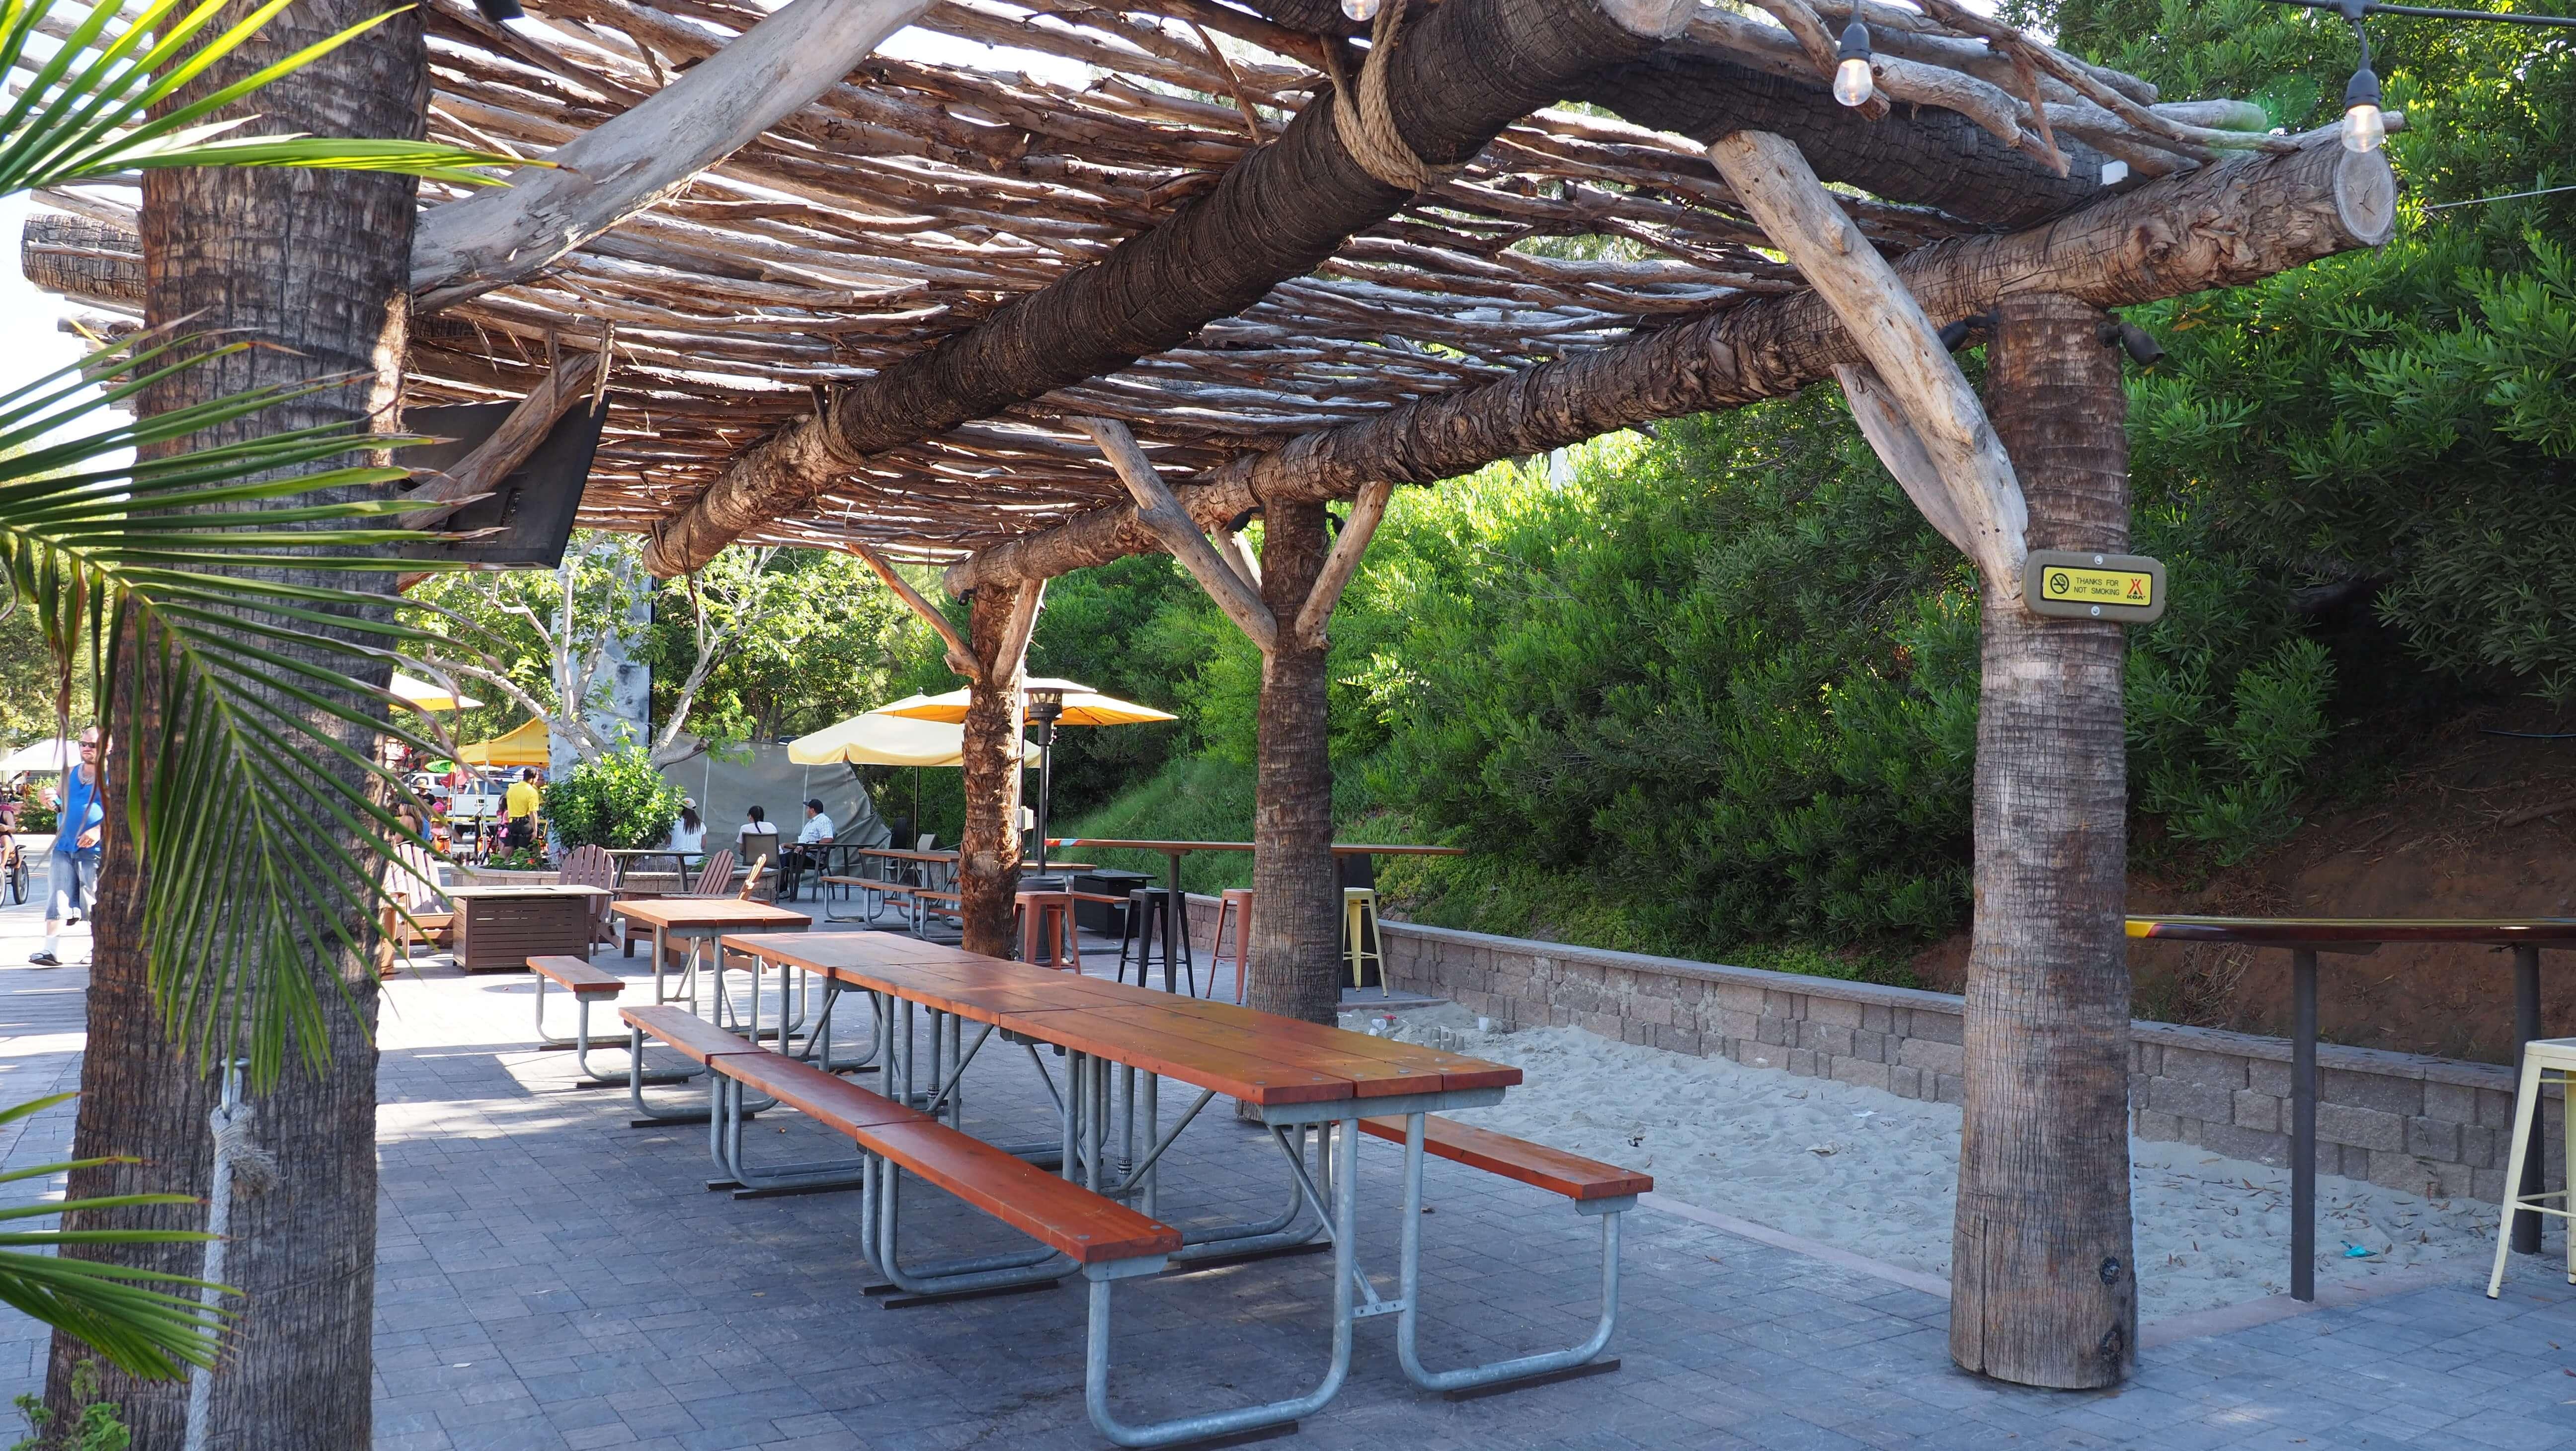 Sand Castle Cafe sitting area